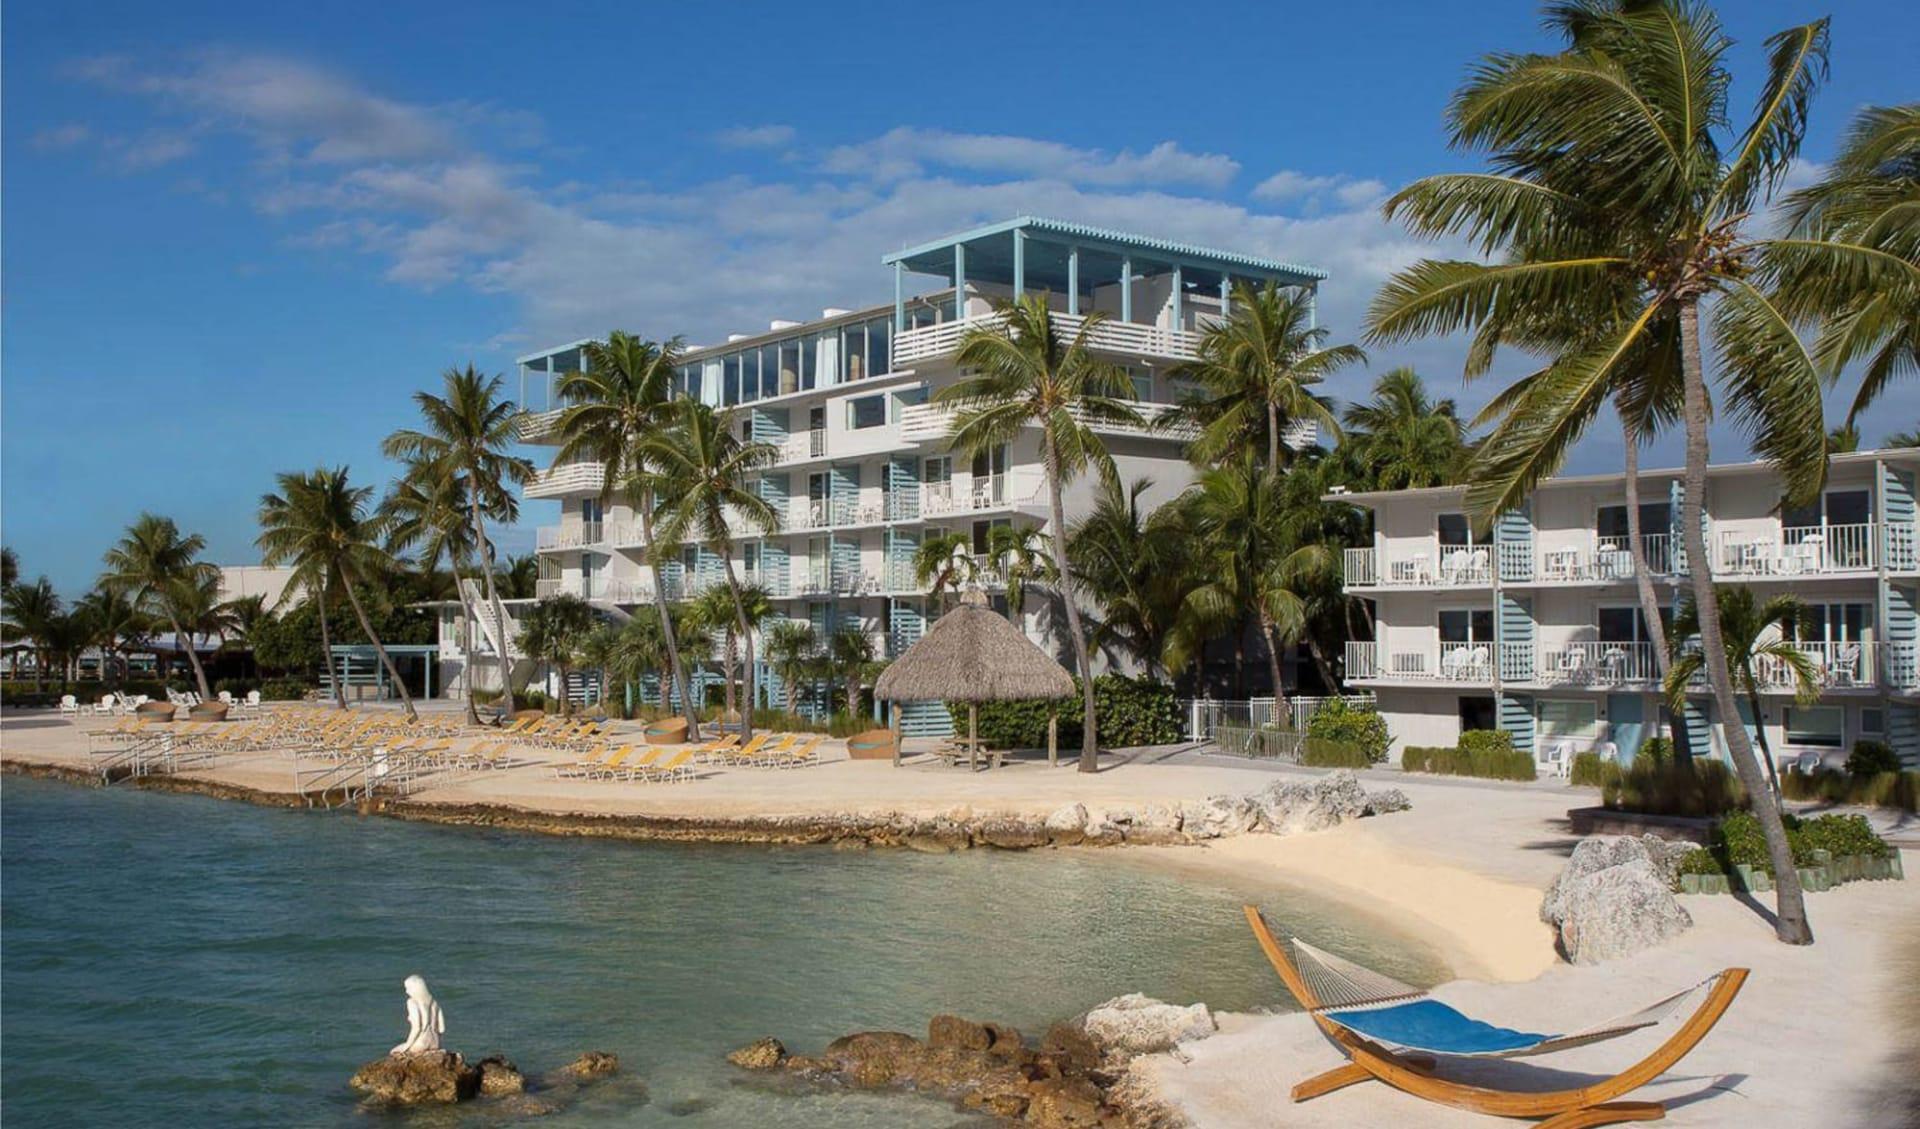 Postcard Inn Beach Resort Islamorada:  Postcard Inn Islamorada_Aussenansicht_HOTELWEBSITE